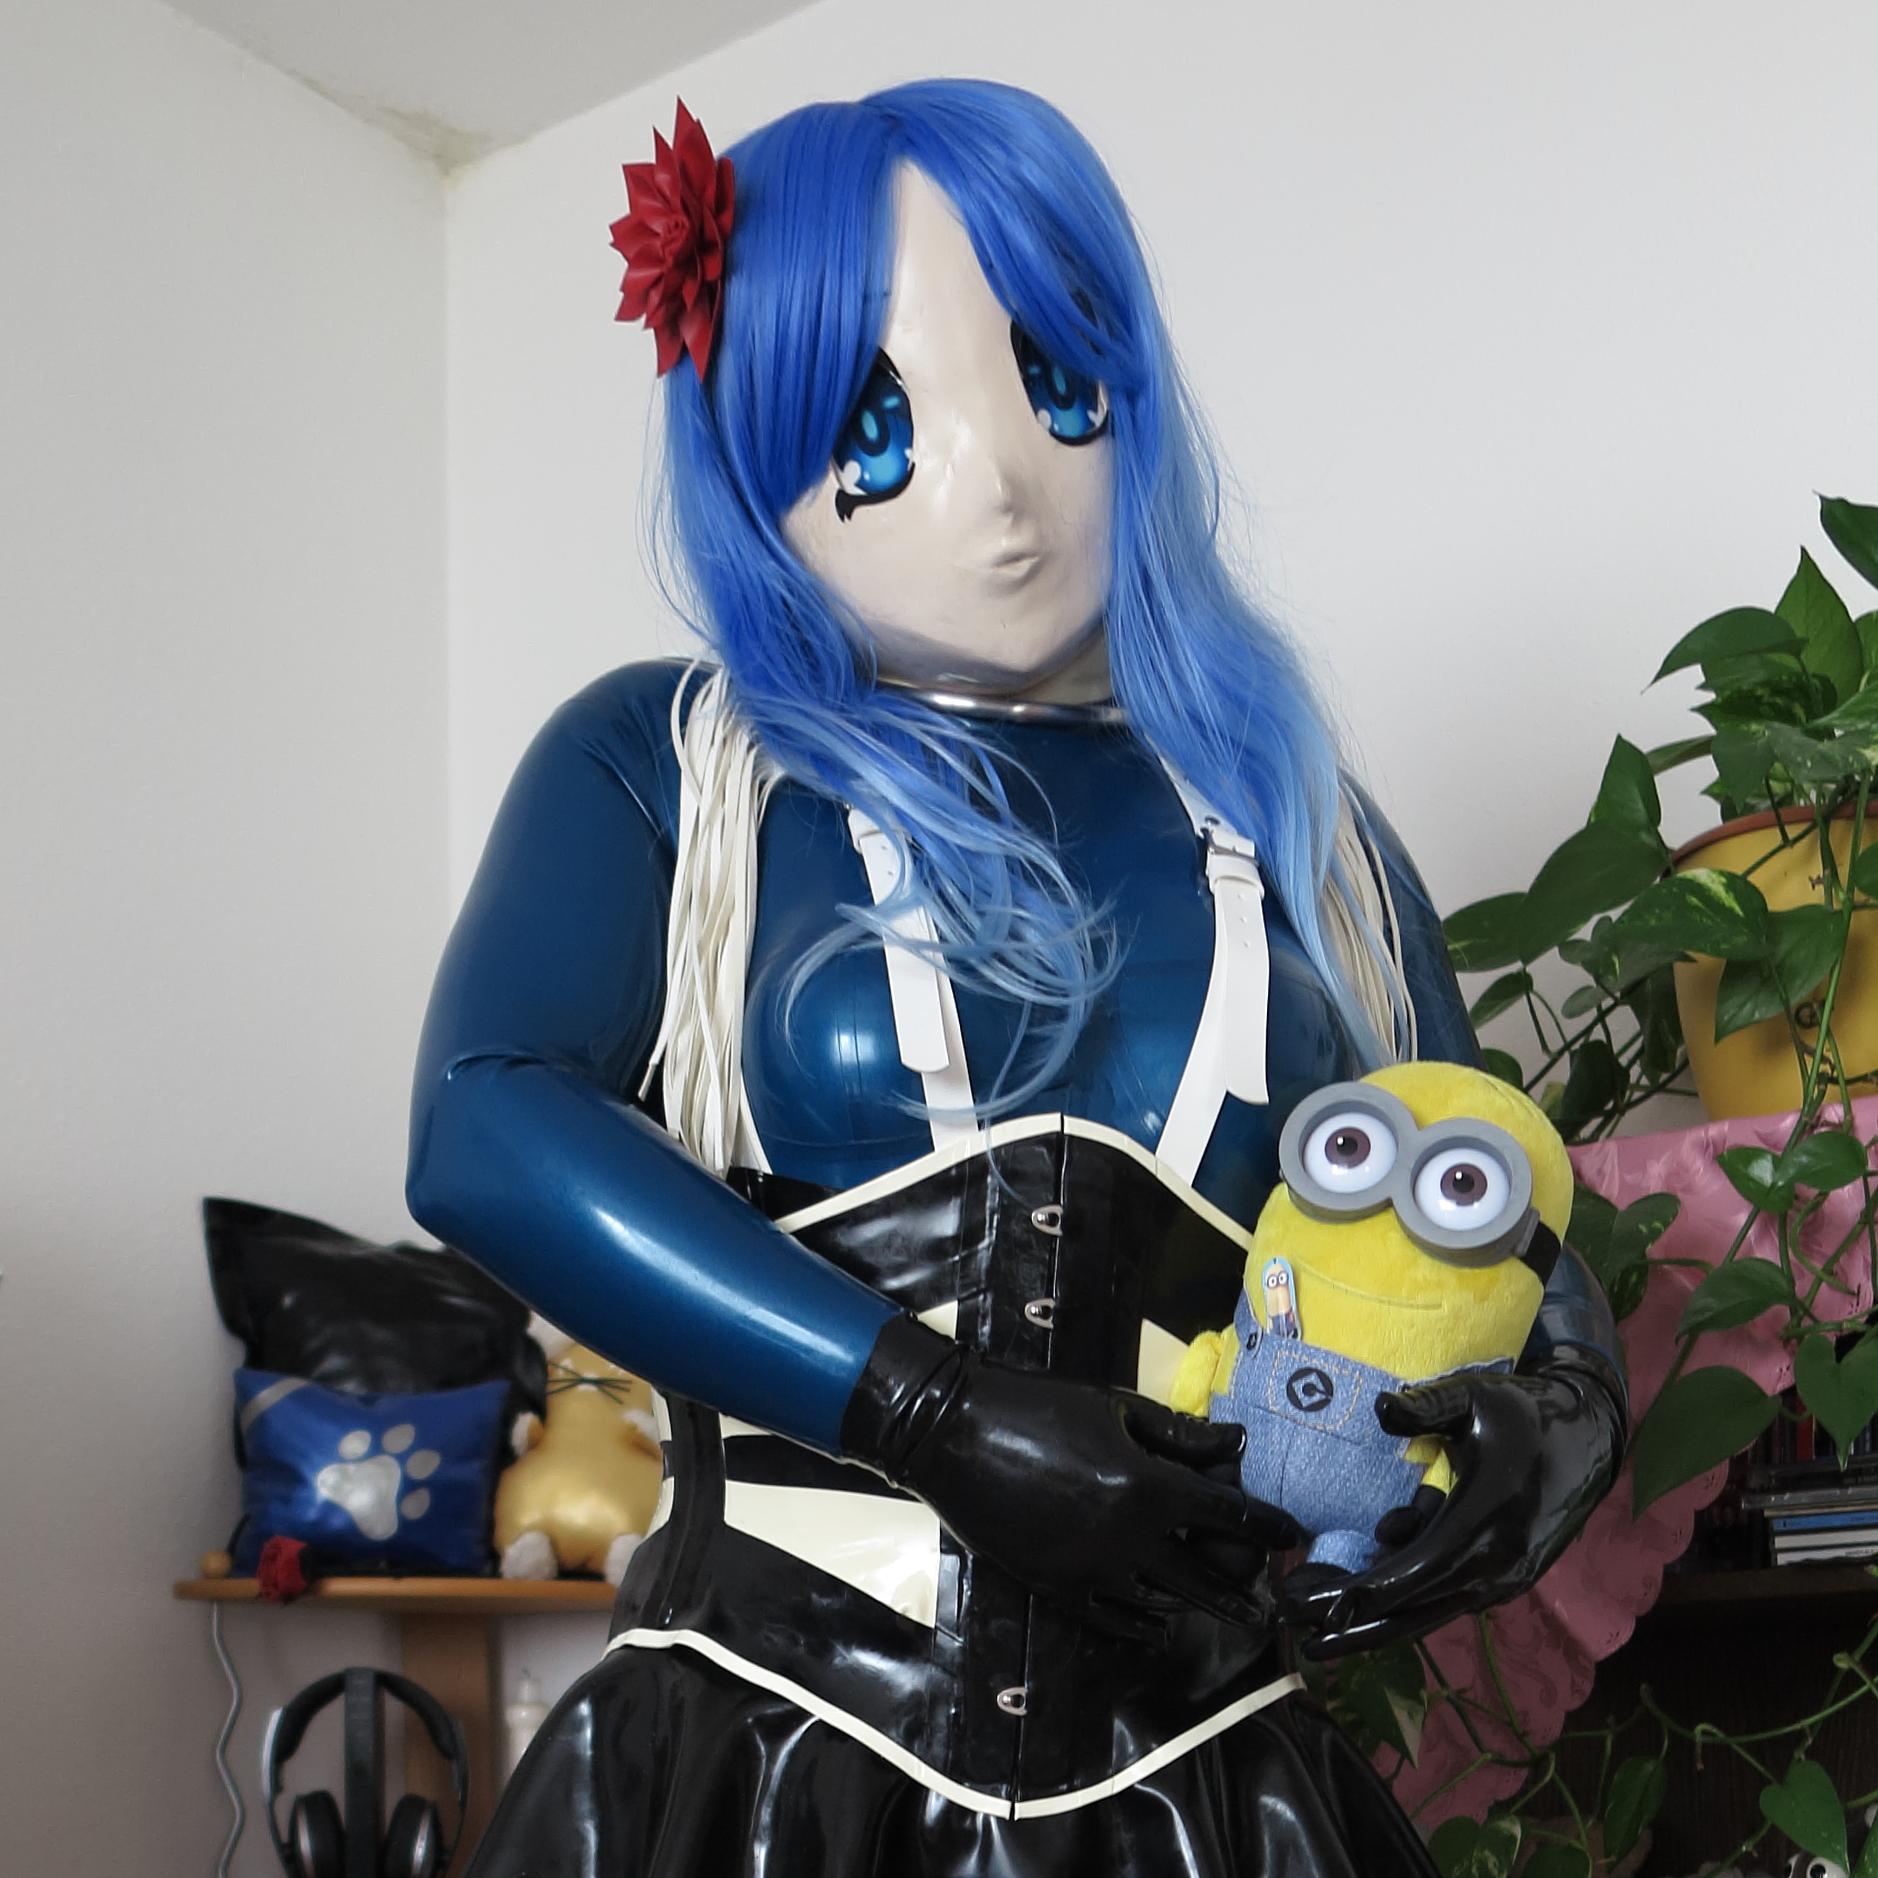 Asuka Akira Kig likes Bob